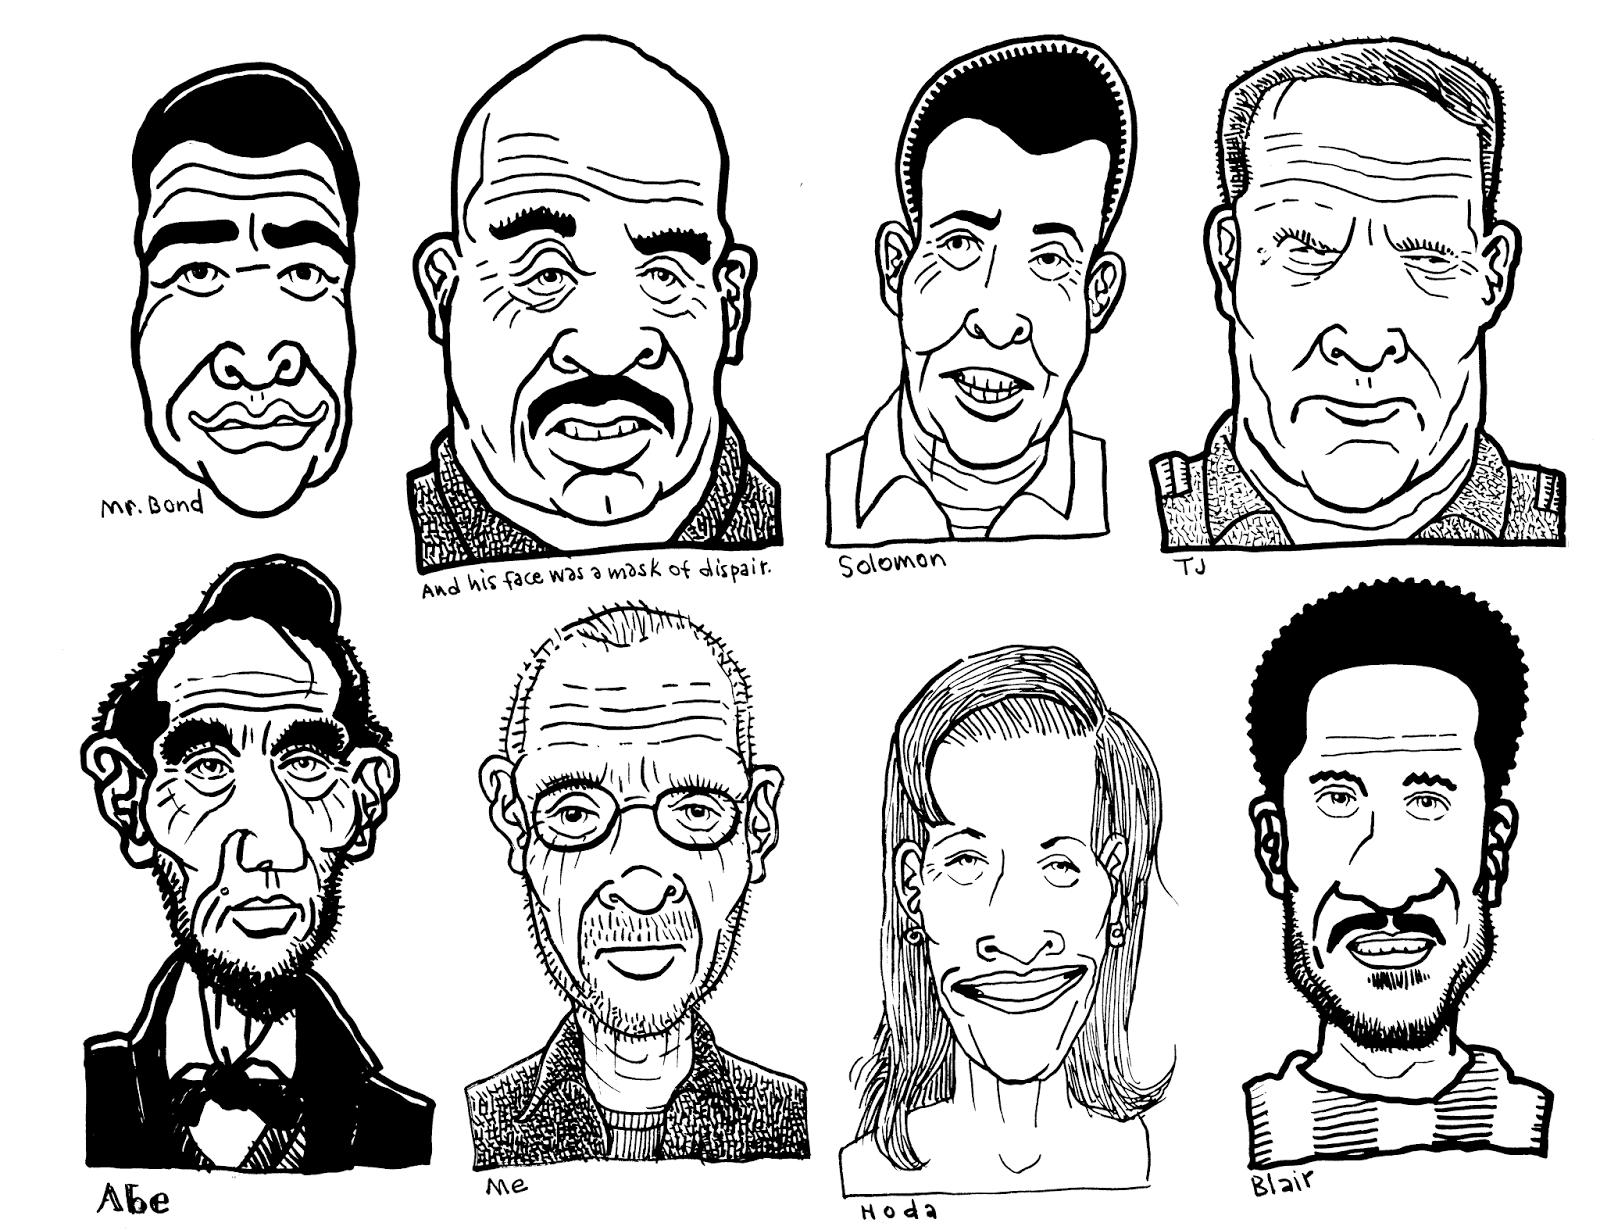 Don Moyer Sketchbook: August 2014